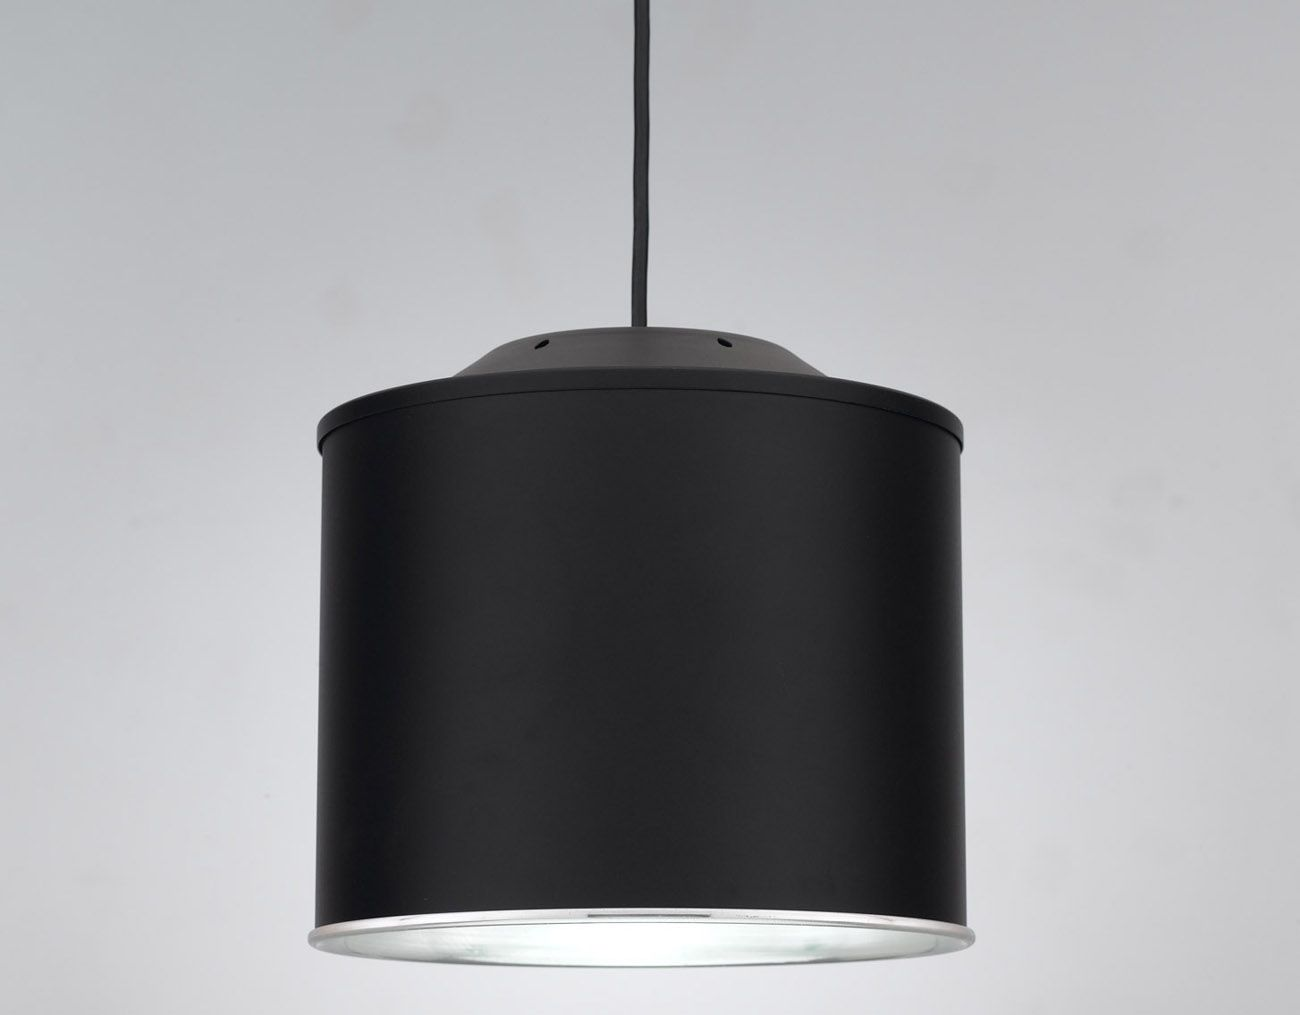 9 X 10 11 X 12 14 X 16 Cfl Led Or Gu24 Cylinder Lights Ceiling Lights Cool Lighting